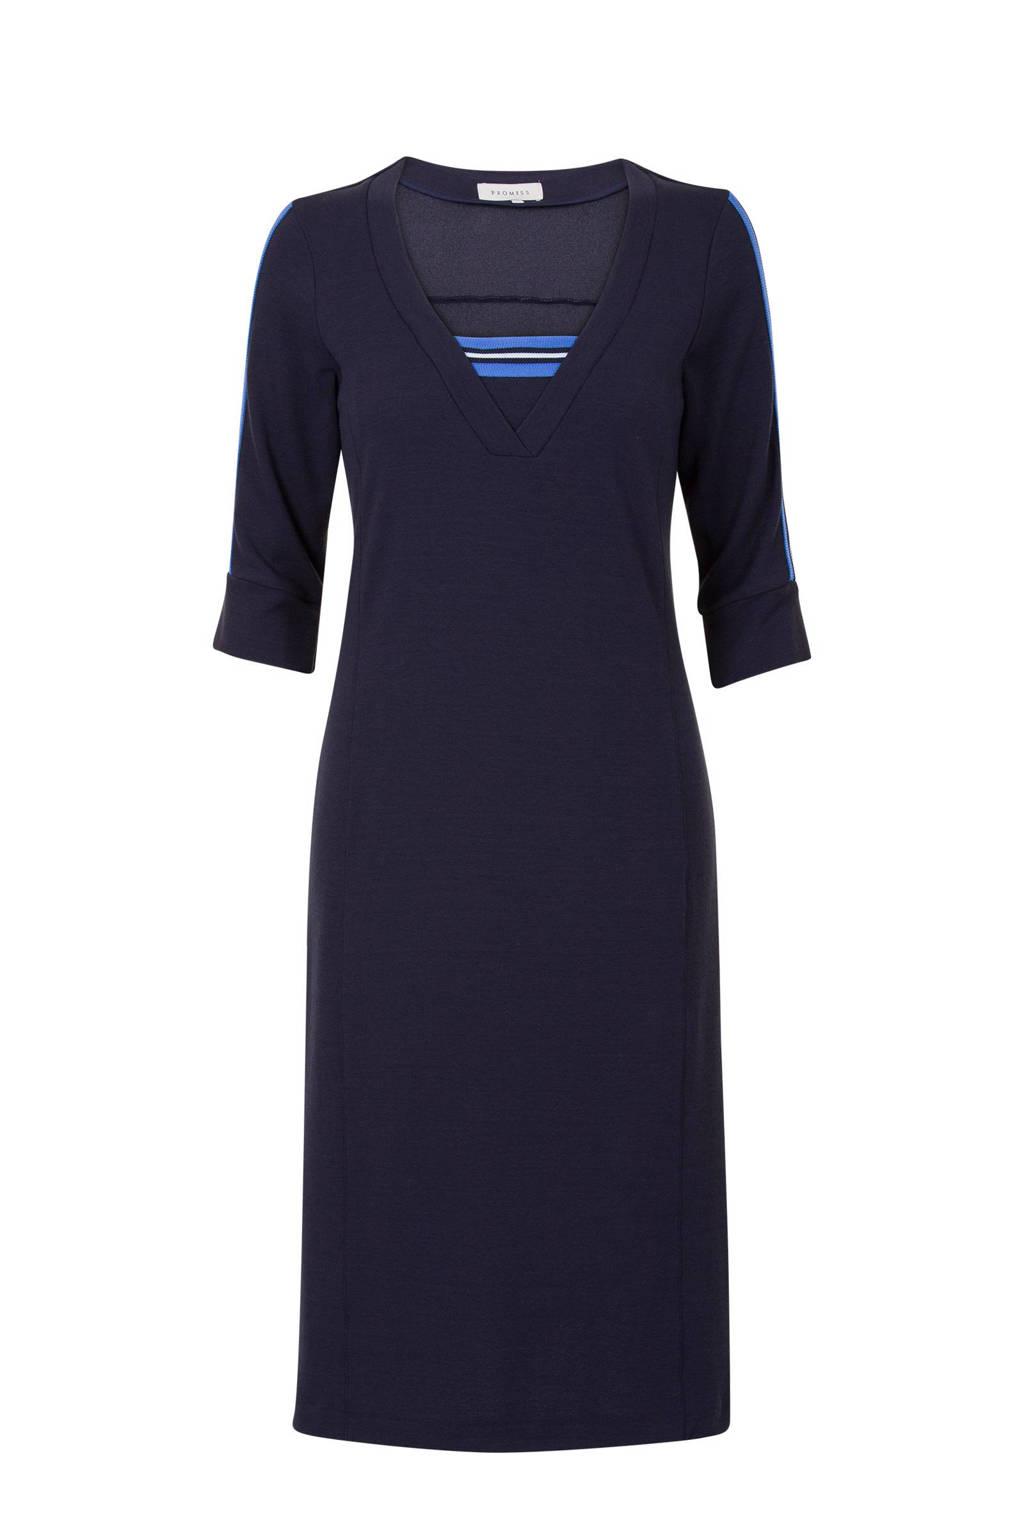 Promiss jurk donkerblauw met contrasterende streep, Donkerblauw